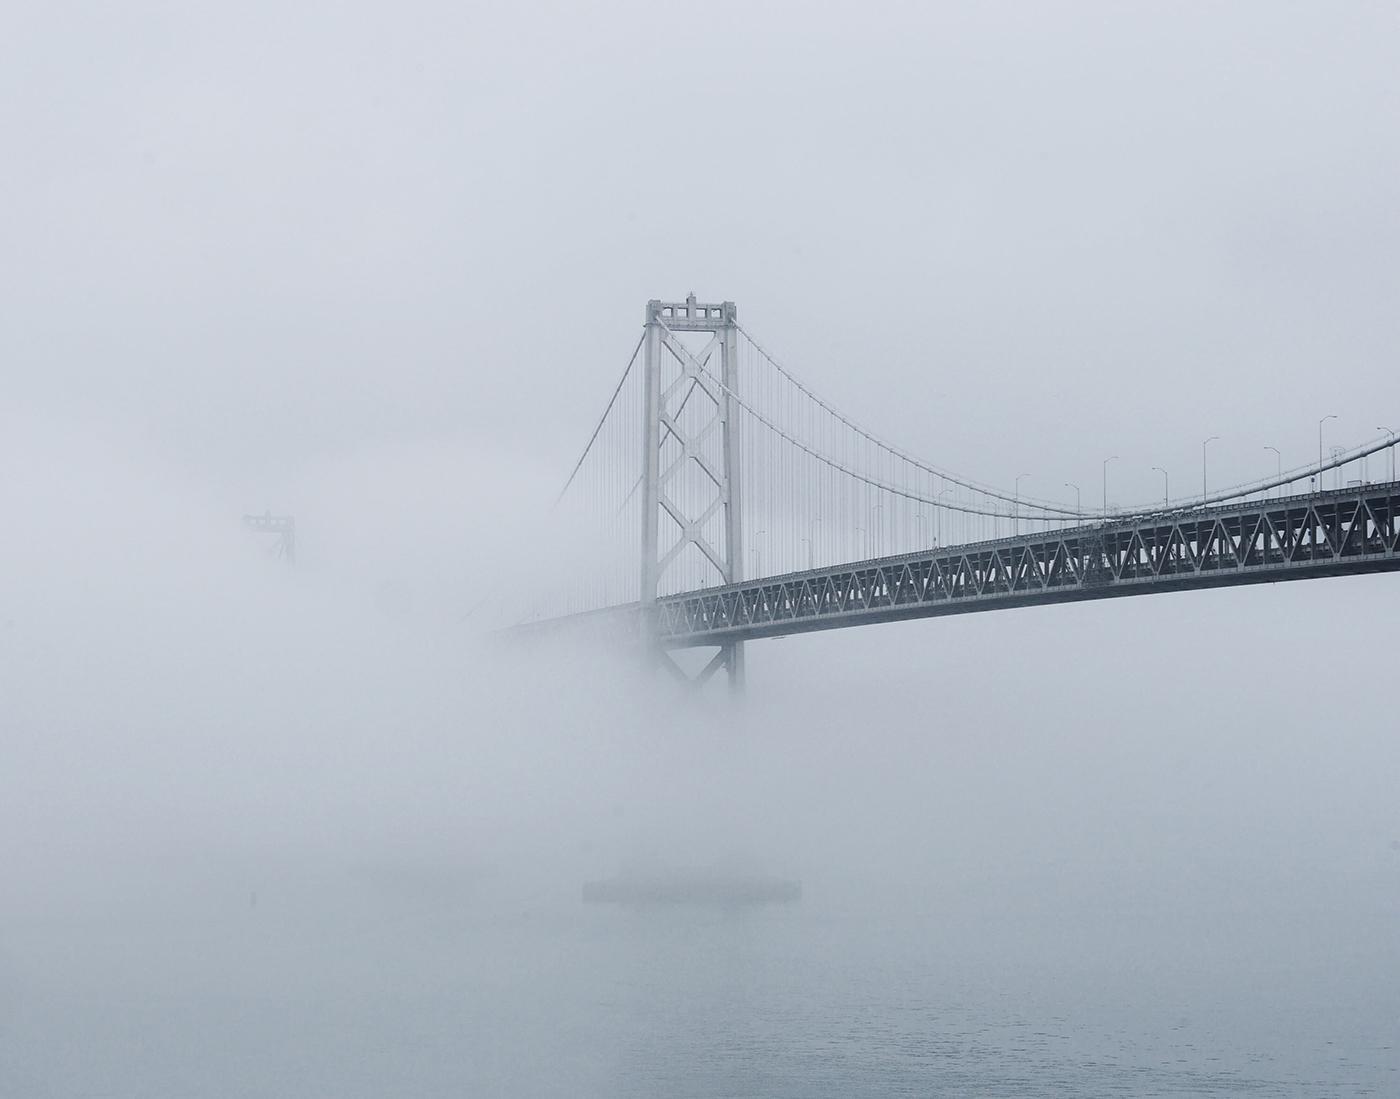 Wallpaper of the Week - Bay Bridge